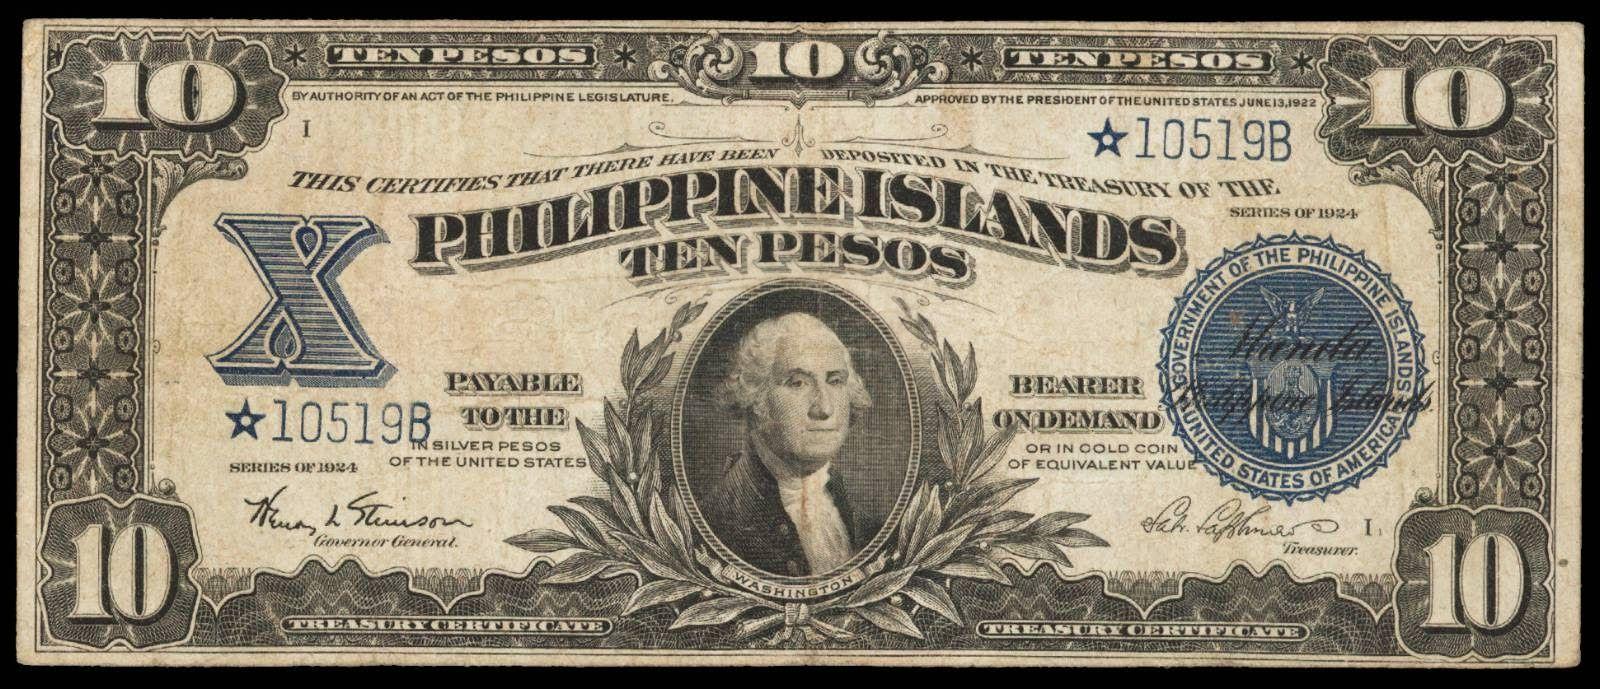 Philippine Islands 10 Pesos Treasury